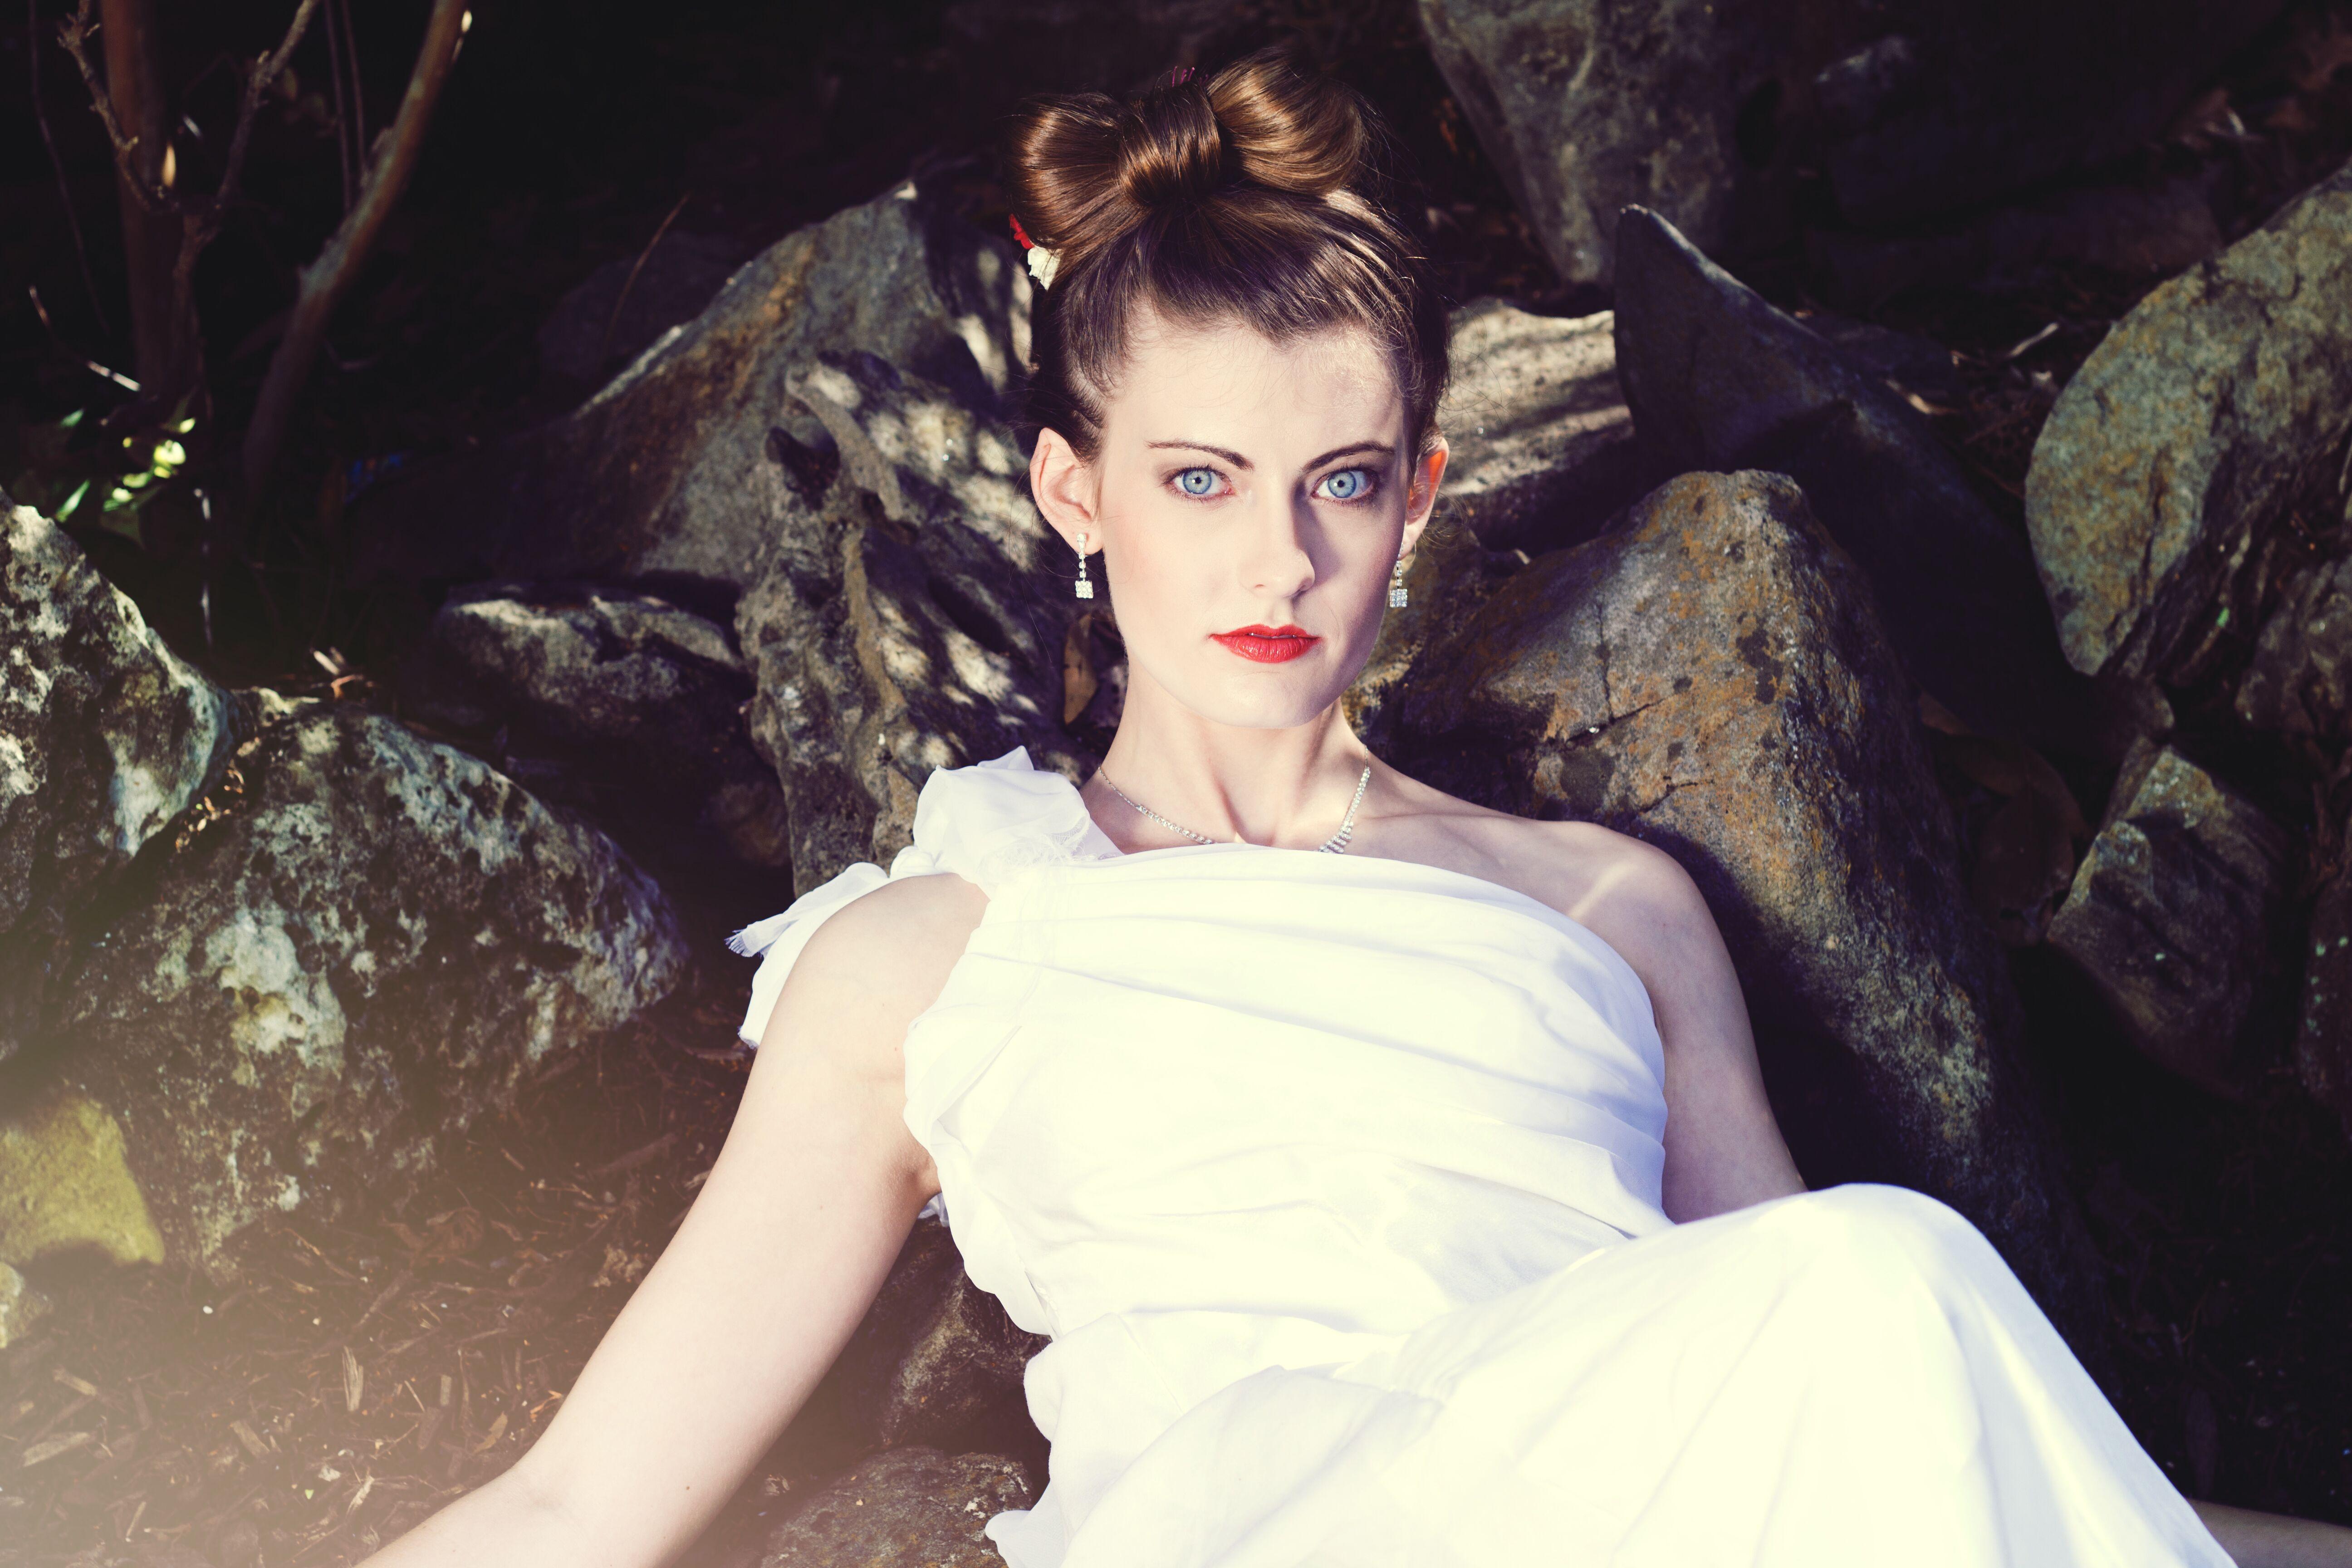 toni murphy makeup and hair | beauty - chattanooga, tn